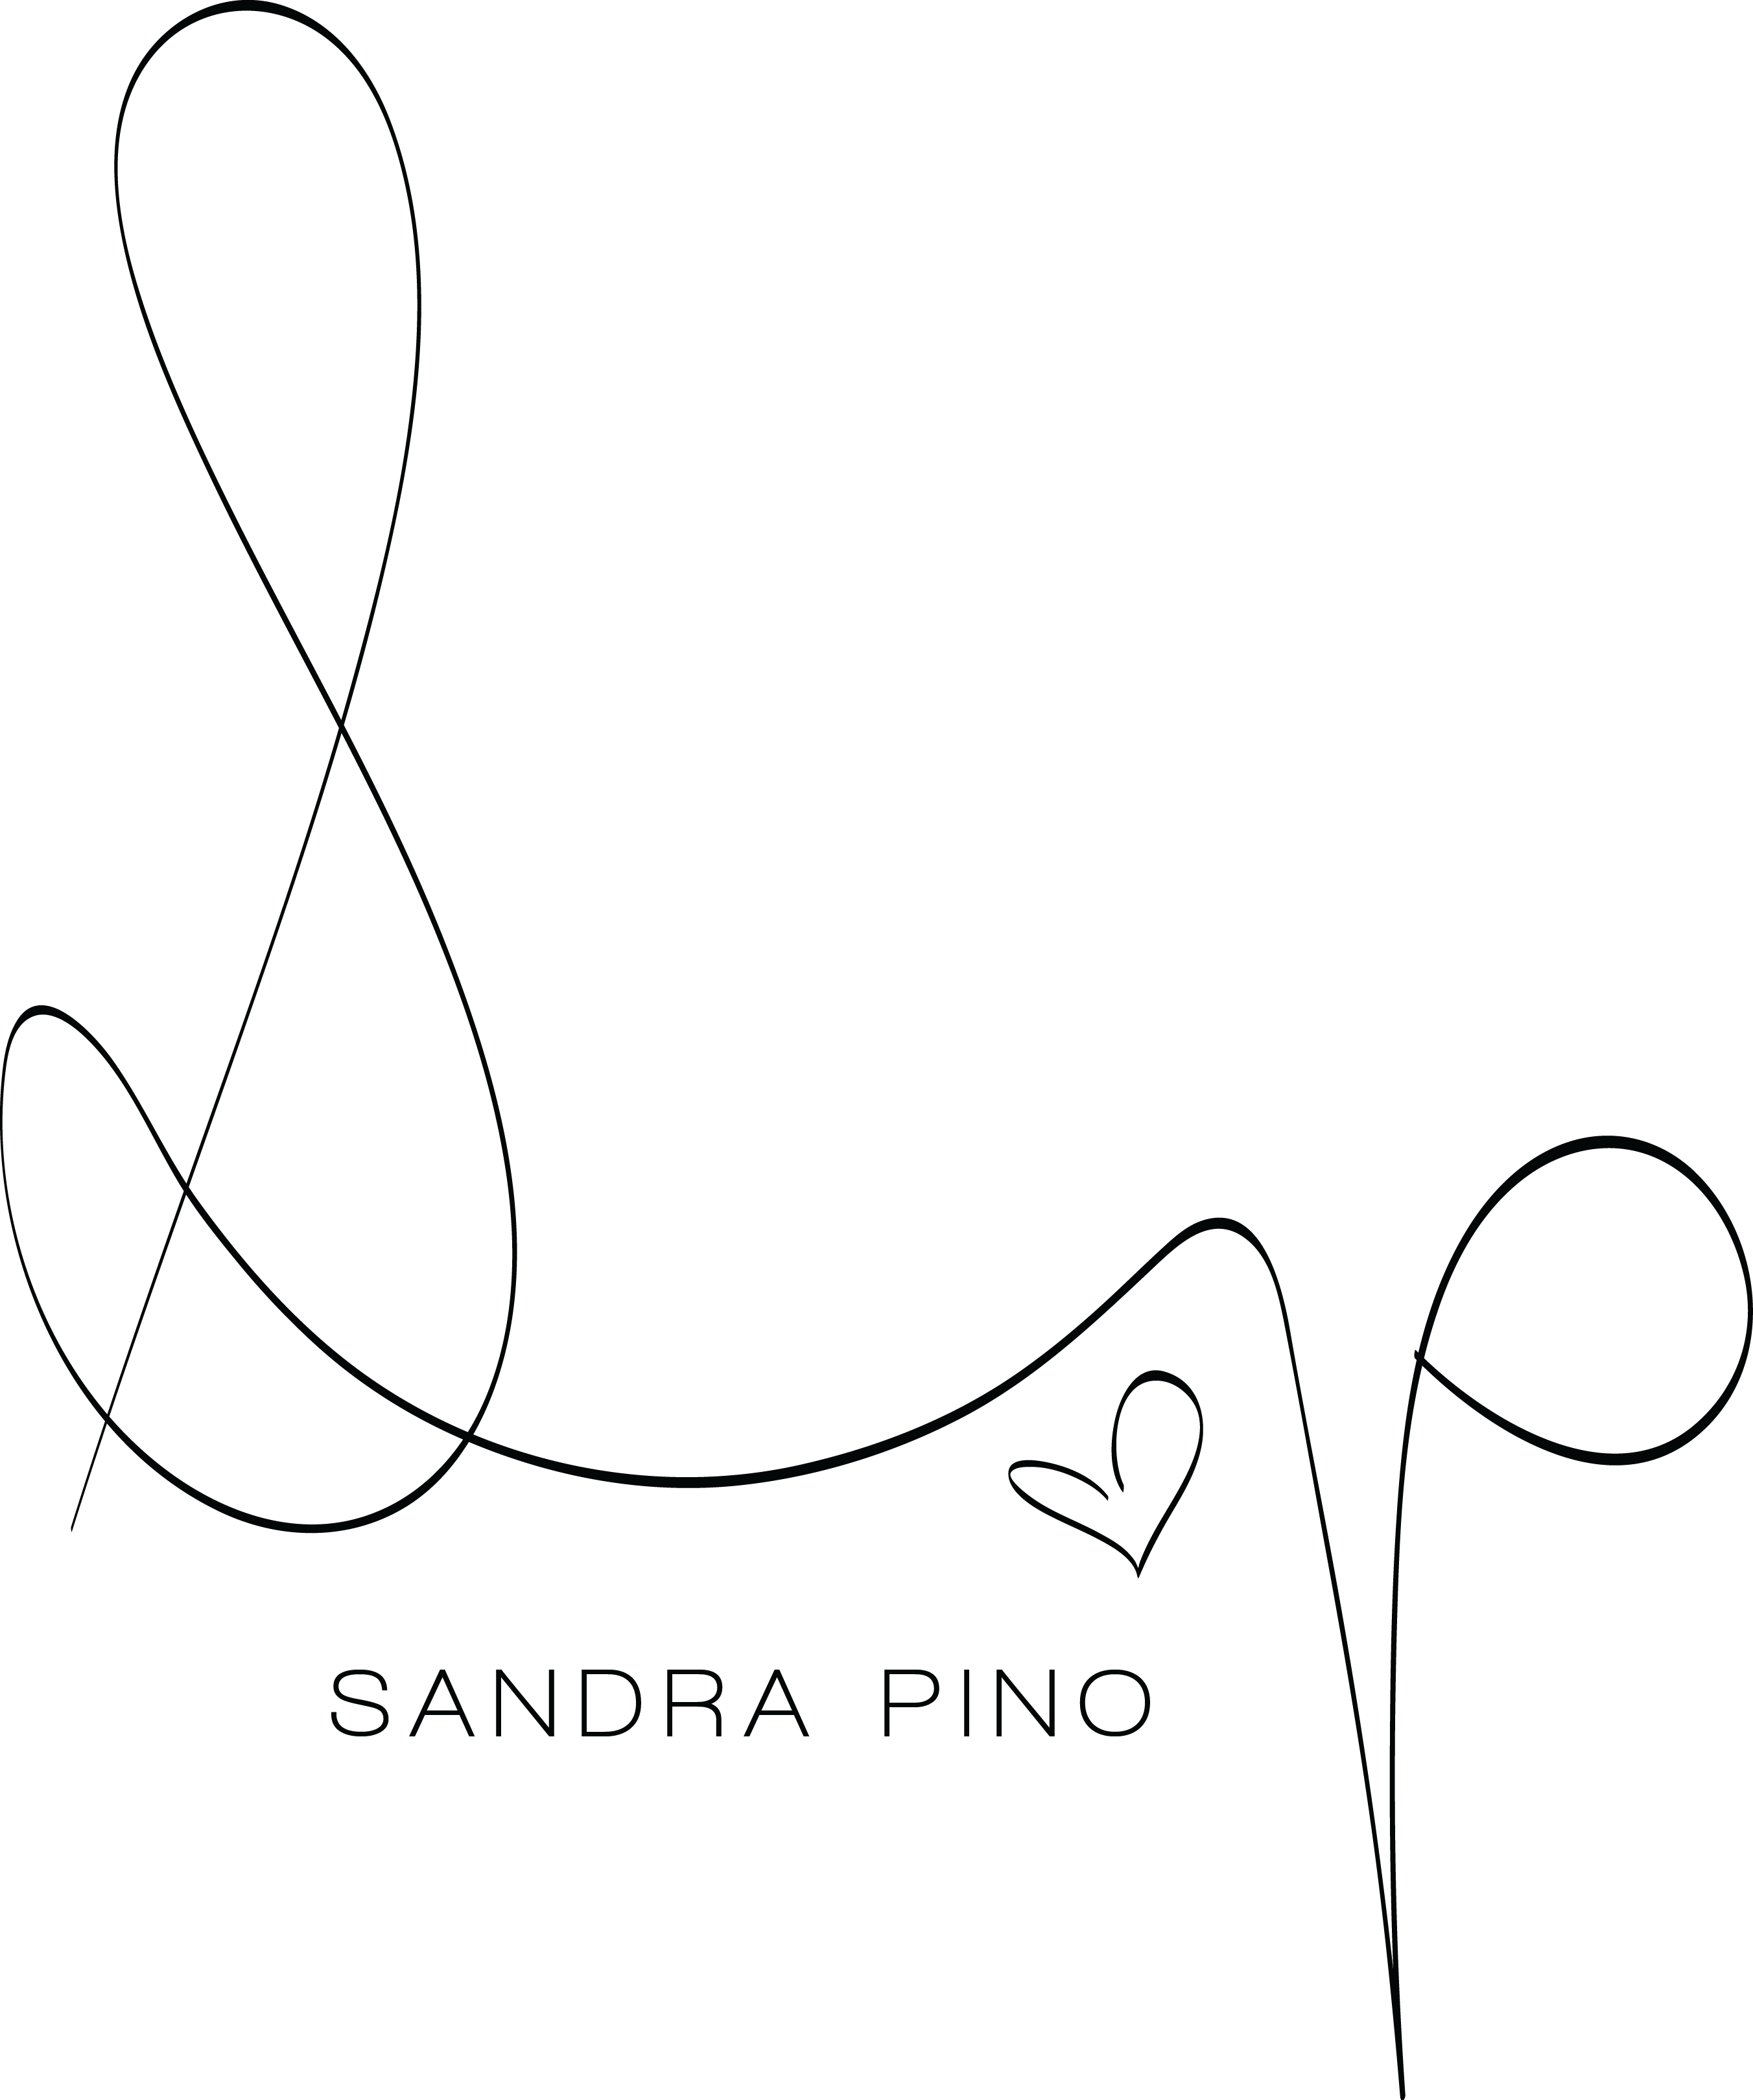 SANDRA PINO FOTOGRAFIA